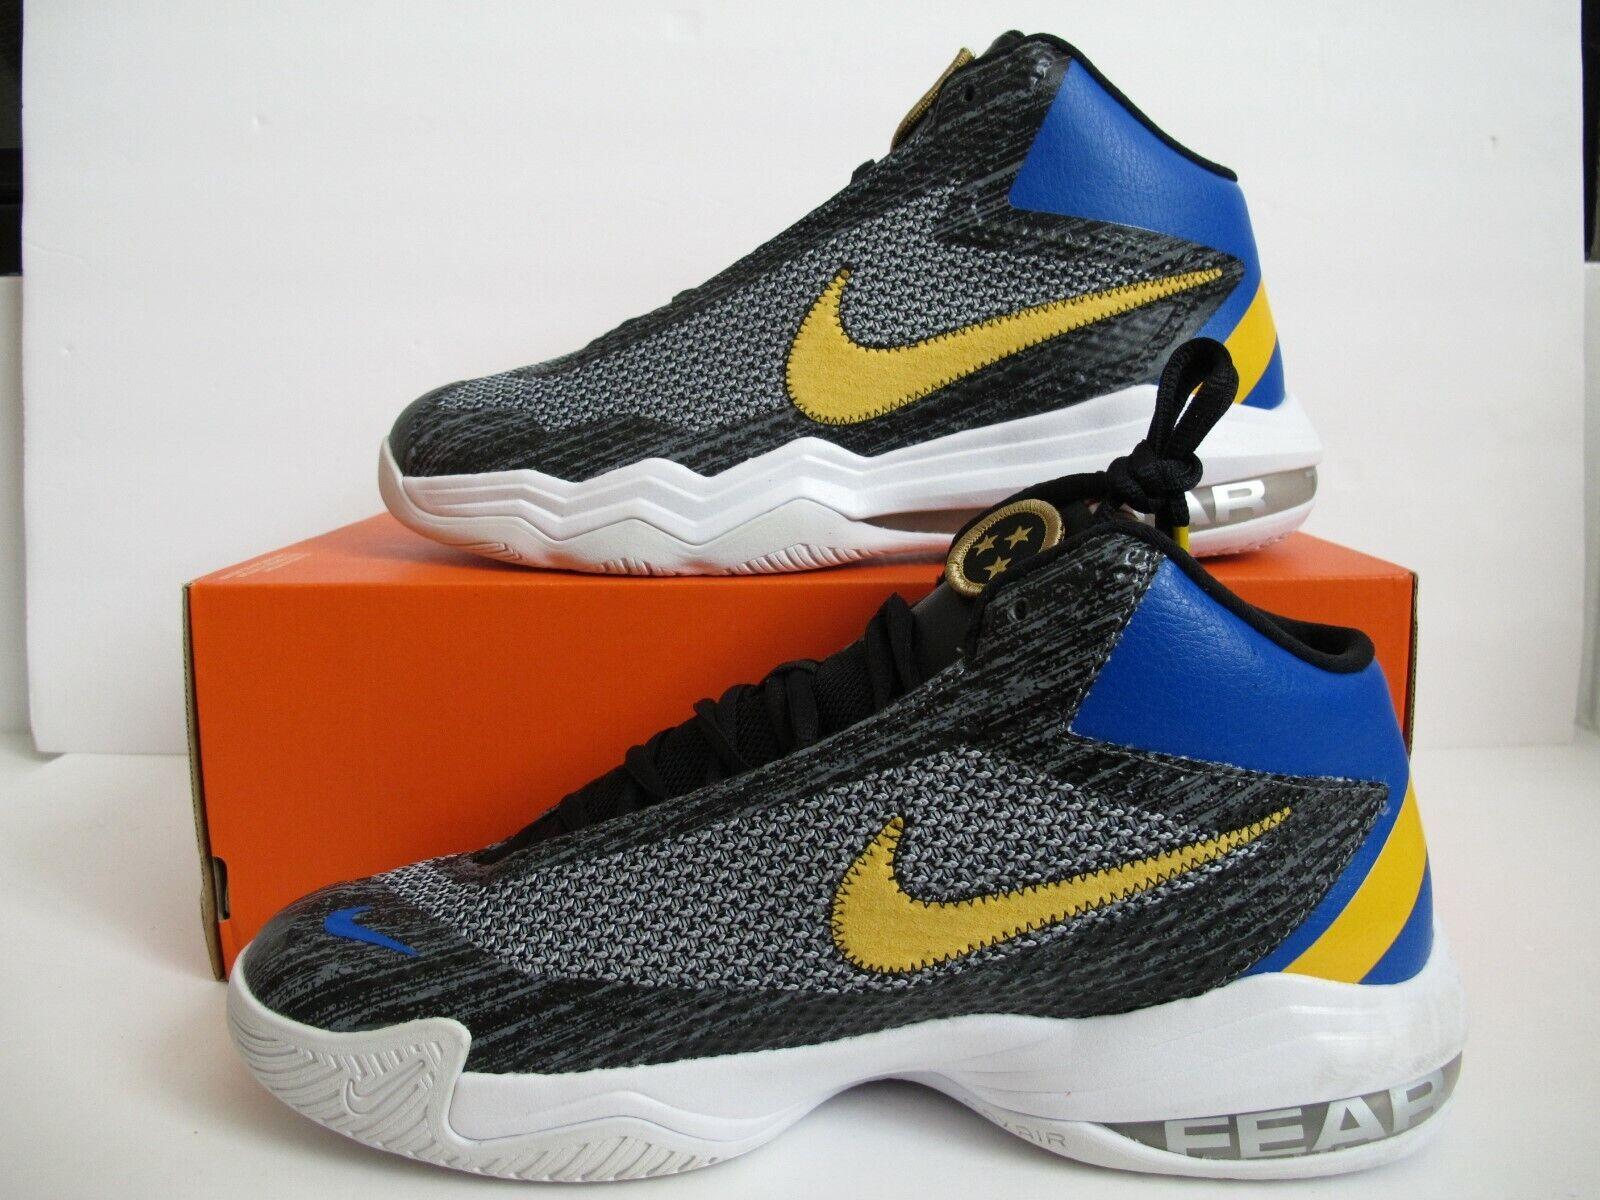 günstig Nike Air Max Audacity ASG LMTD Schuhe Herren Blau